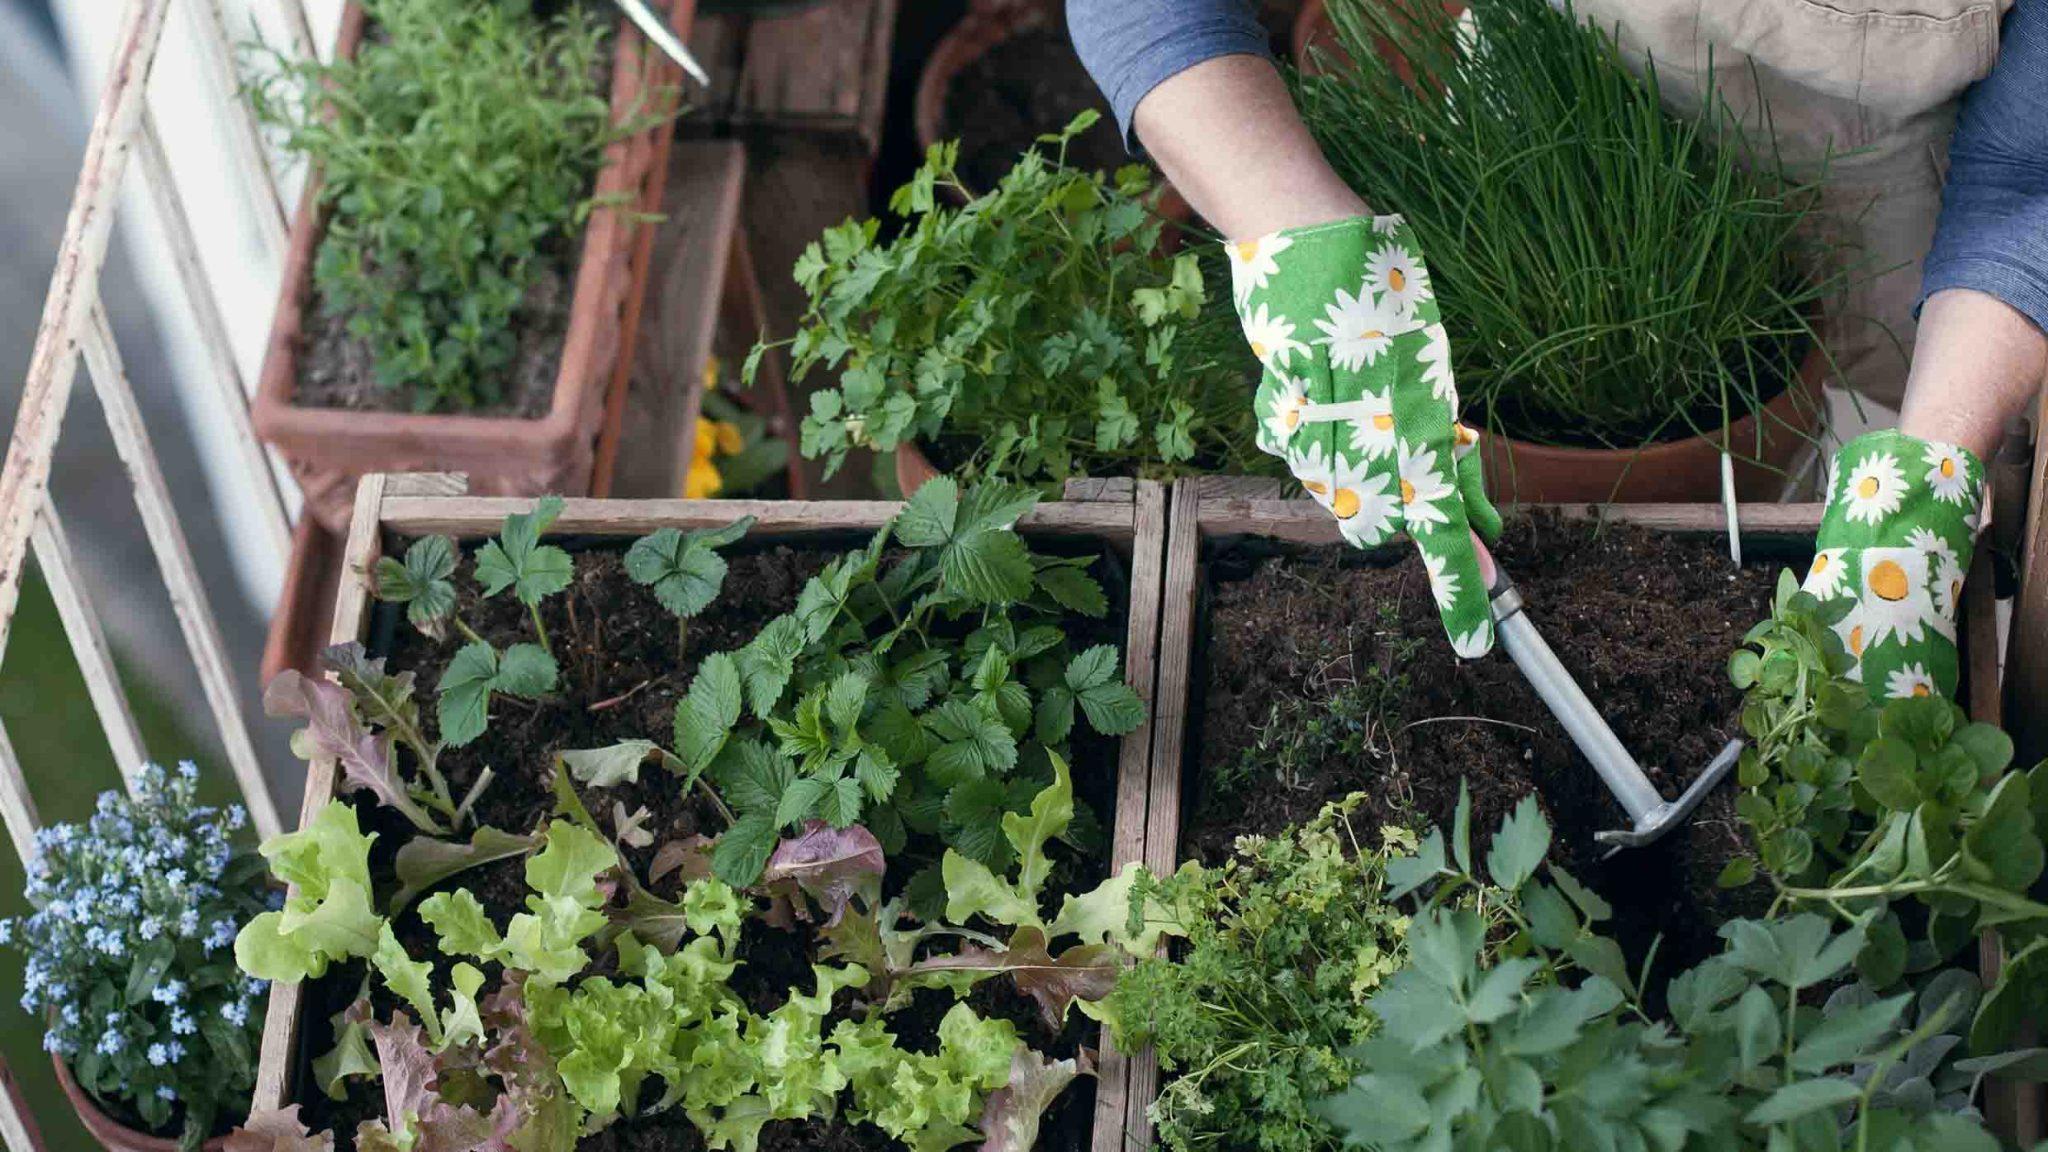 Person gardening on balcony